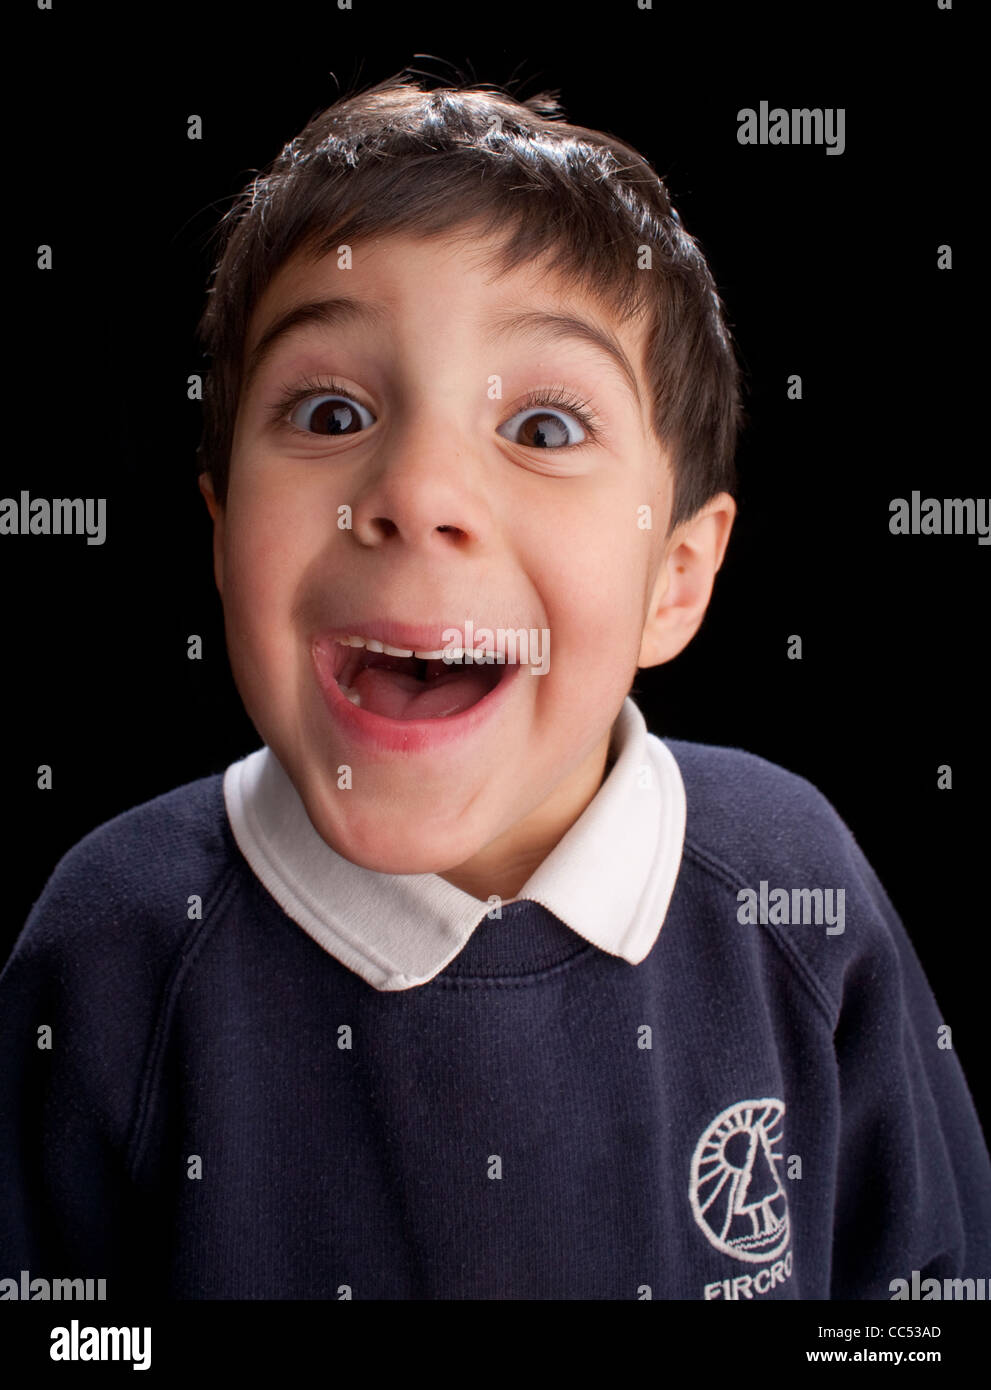 Niño sonriendo, Foto de estudio Imagen De Stock